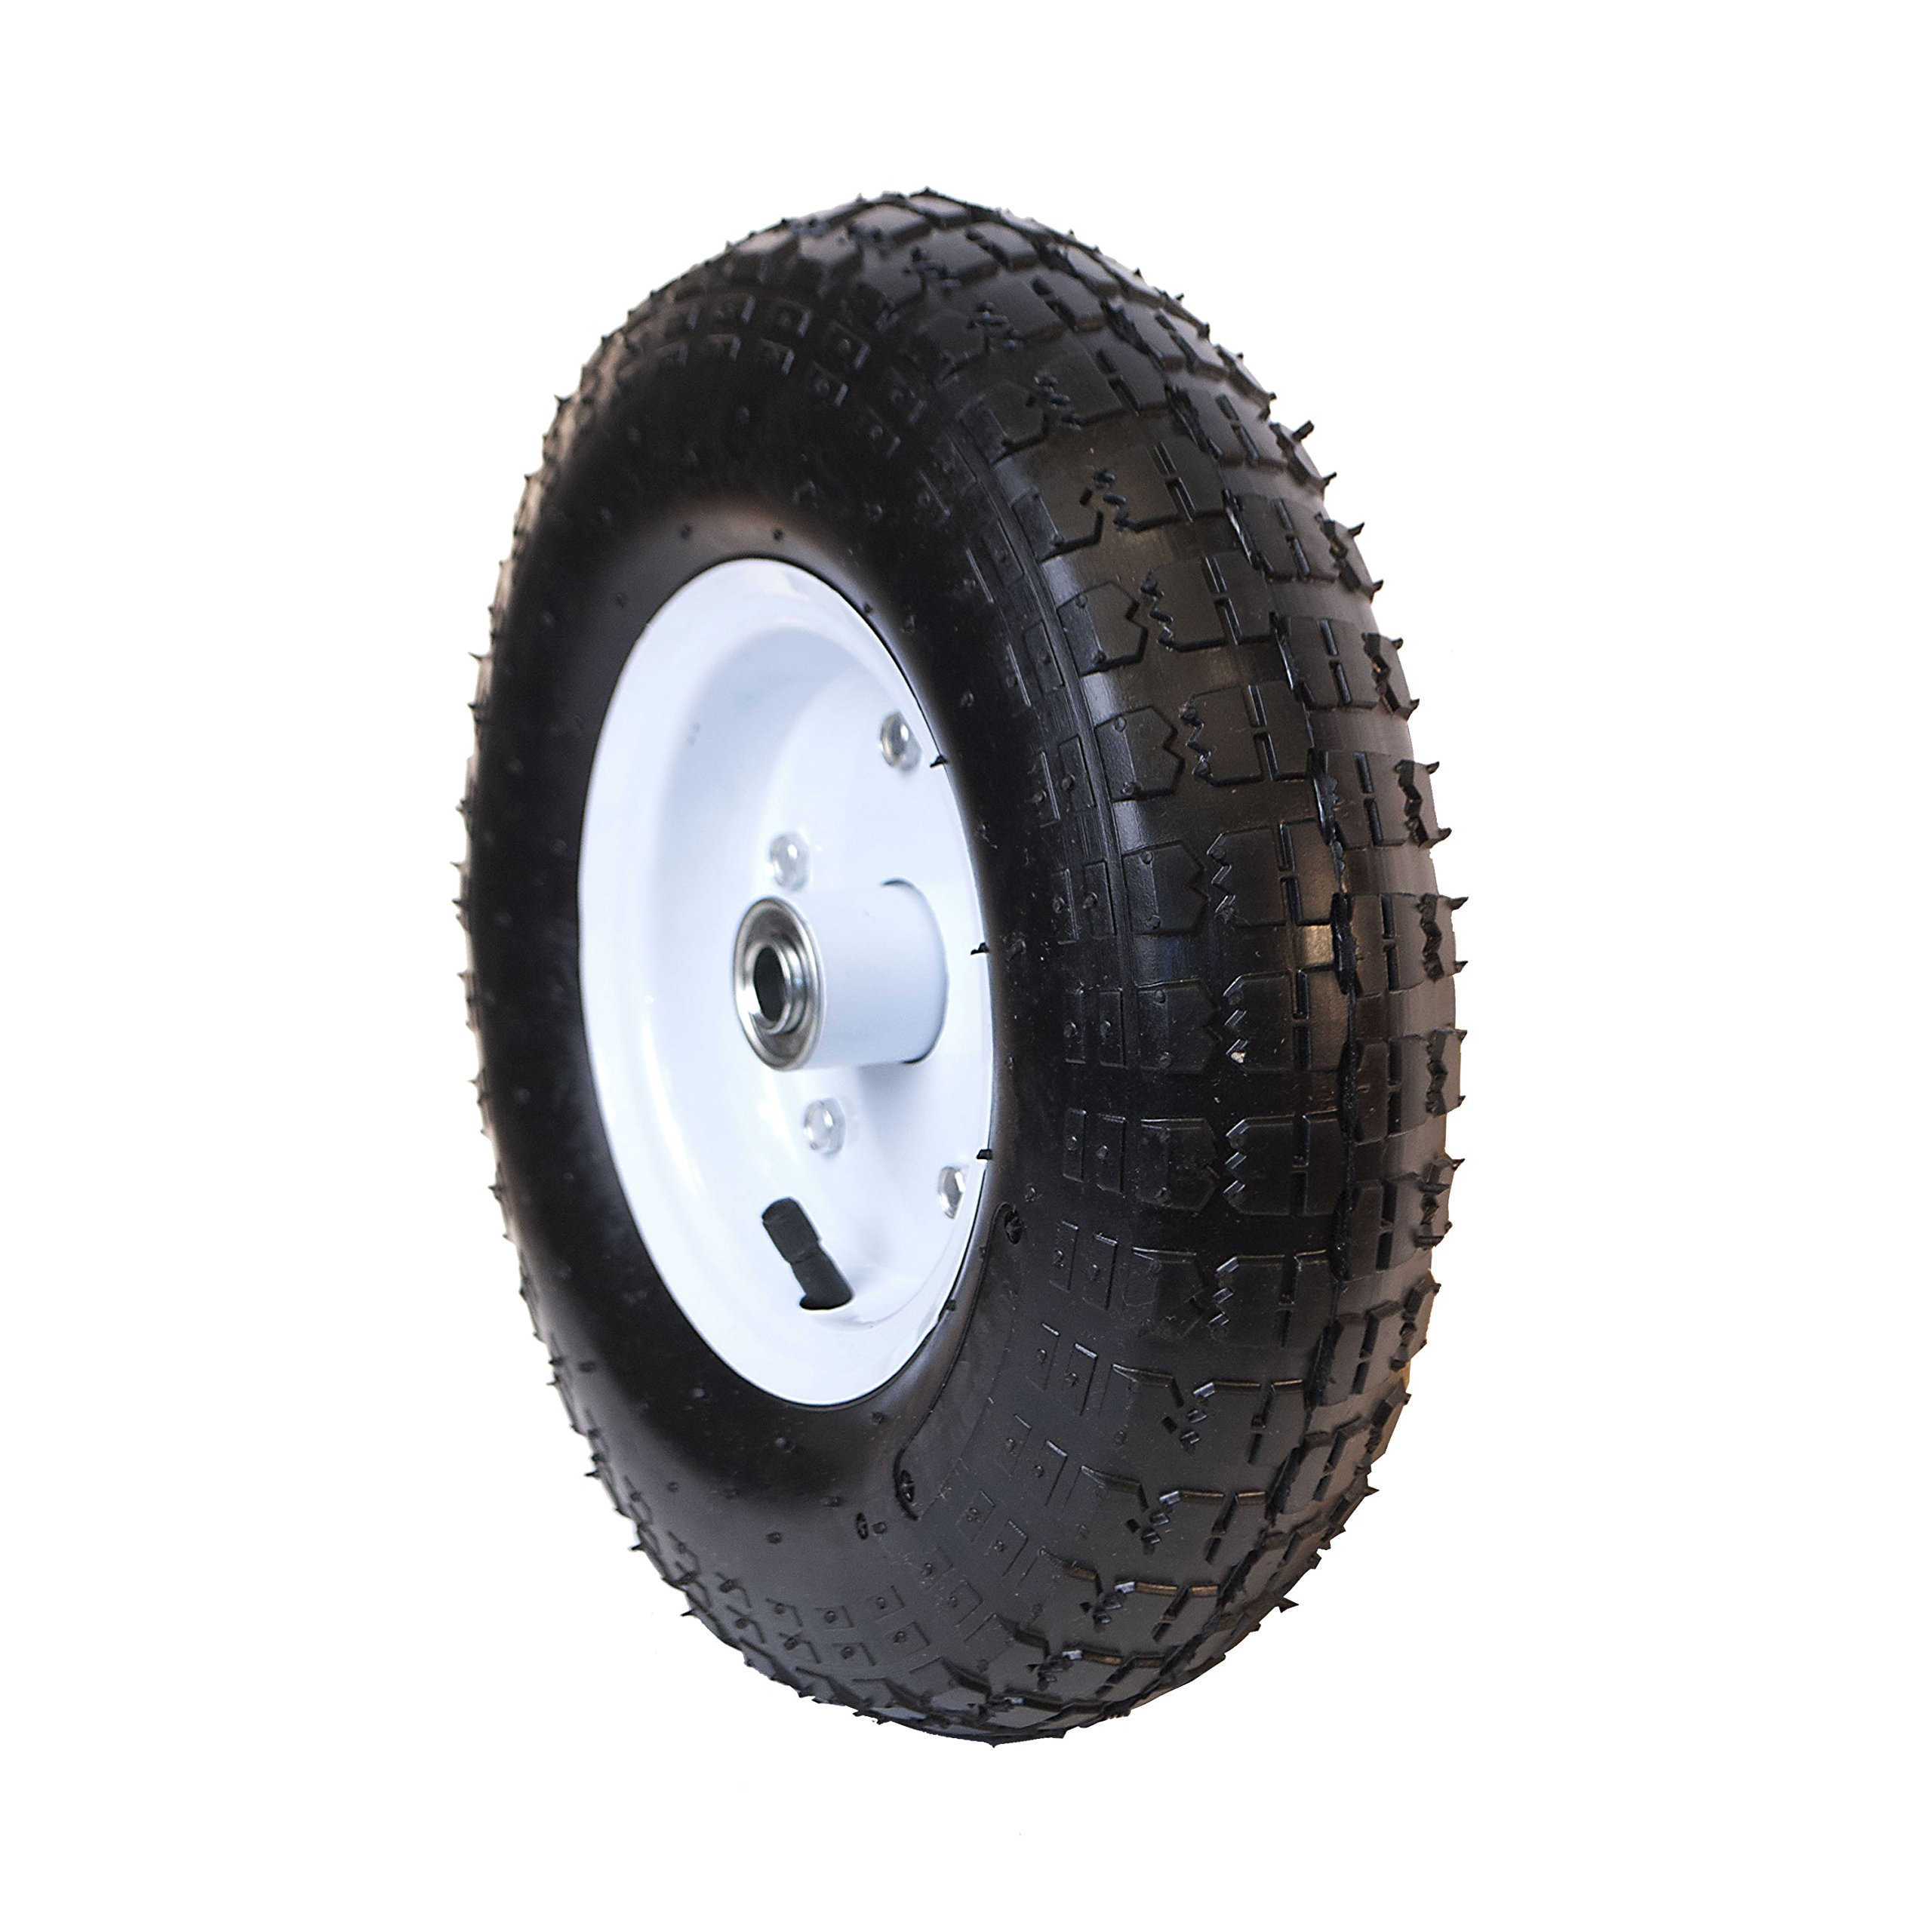 ALEKO WAP13 Pneumatic Replacement Wheel for Wheelbarrow Air Filled Turf Tire for Hand Trucks 13 Inches Black White Rim